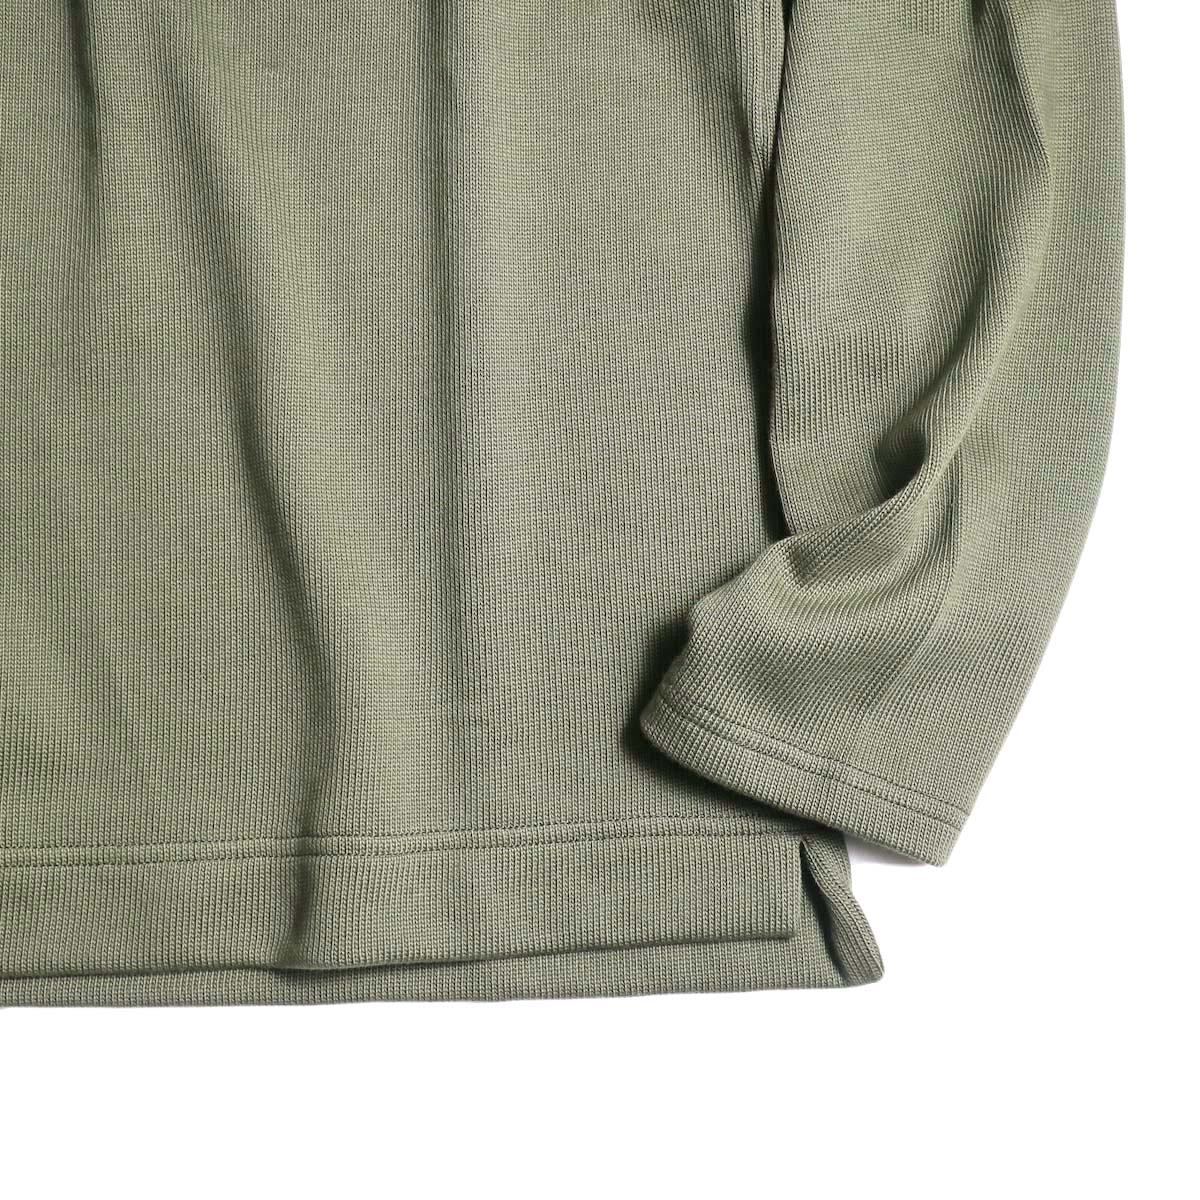 Jackman / Heavy Pima Crewneck (khaki) 裾、袖